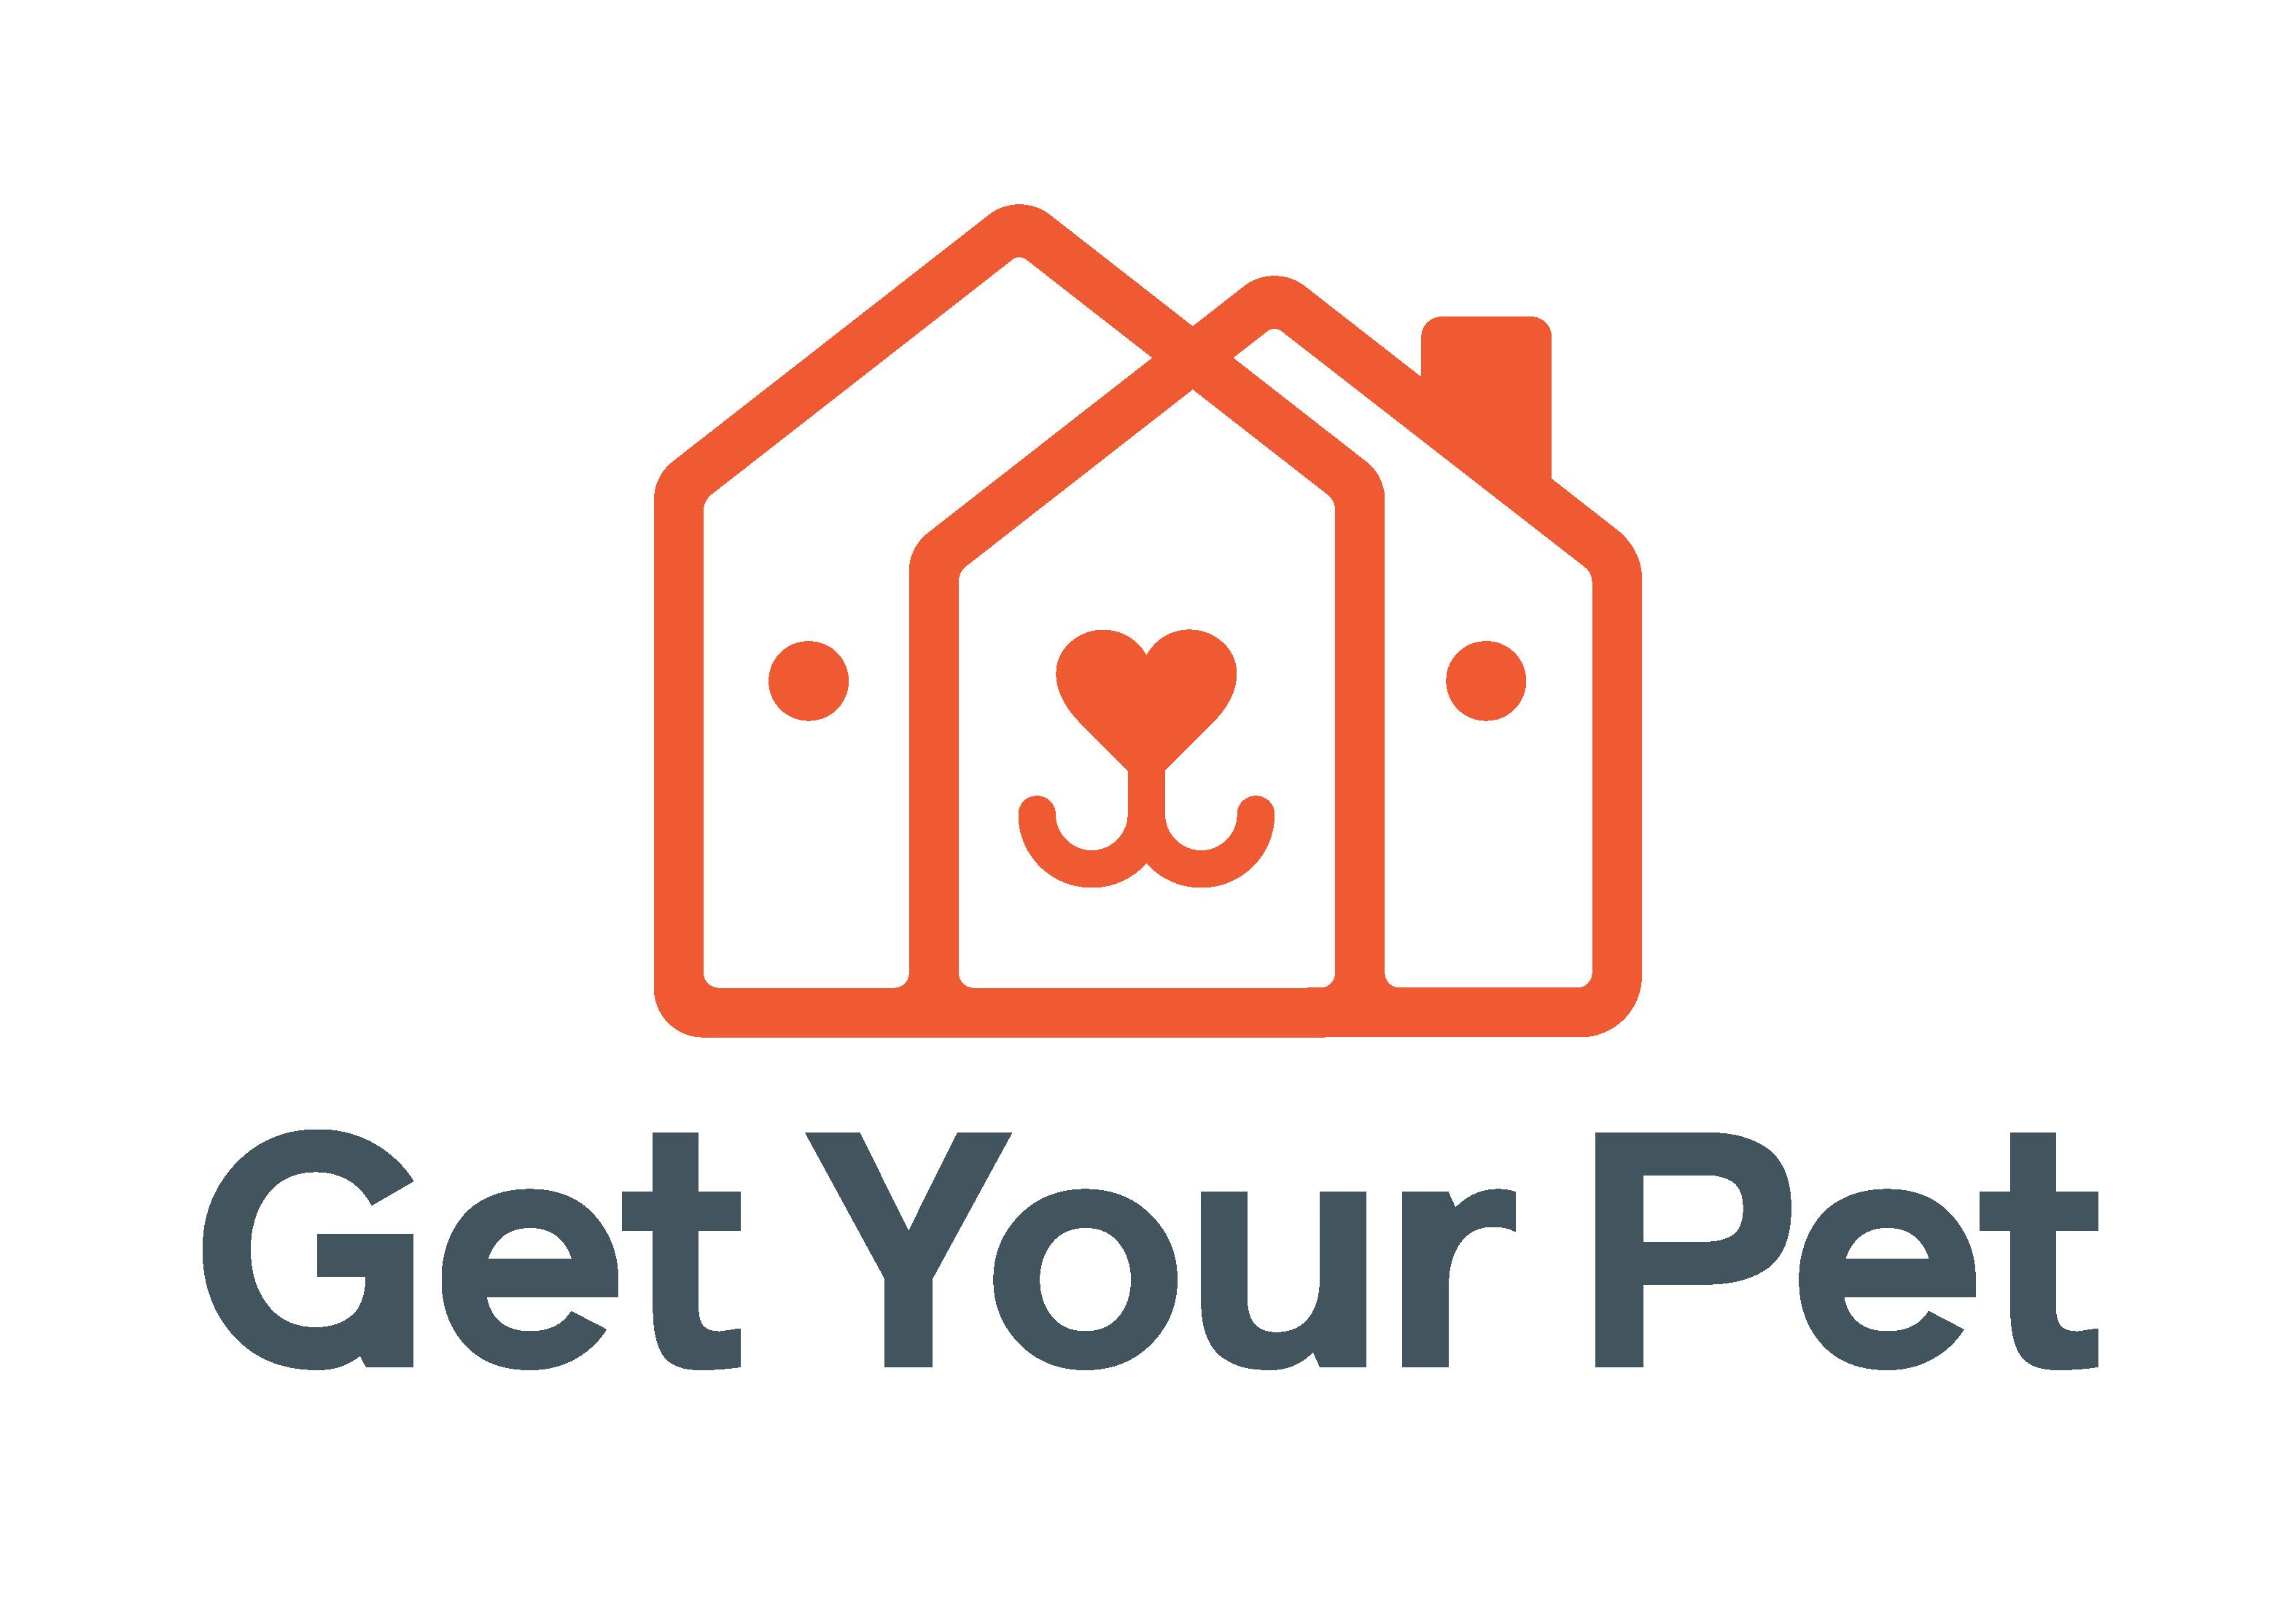 GetYourPet.com